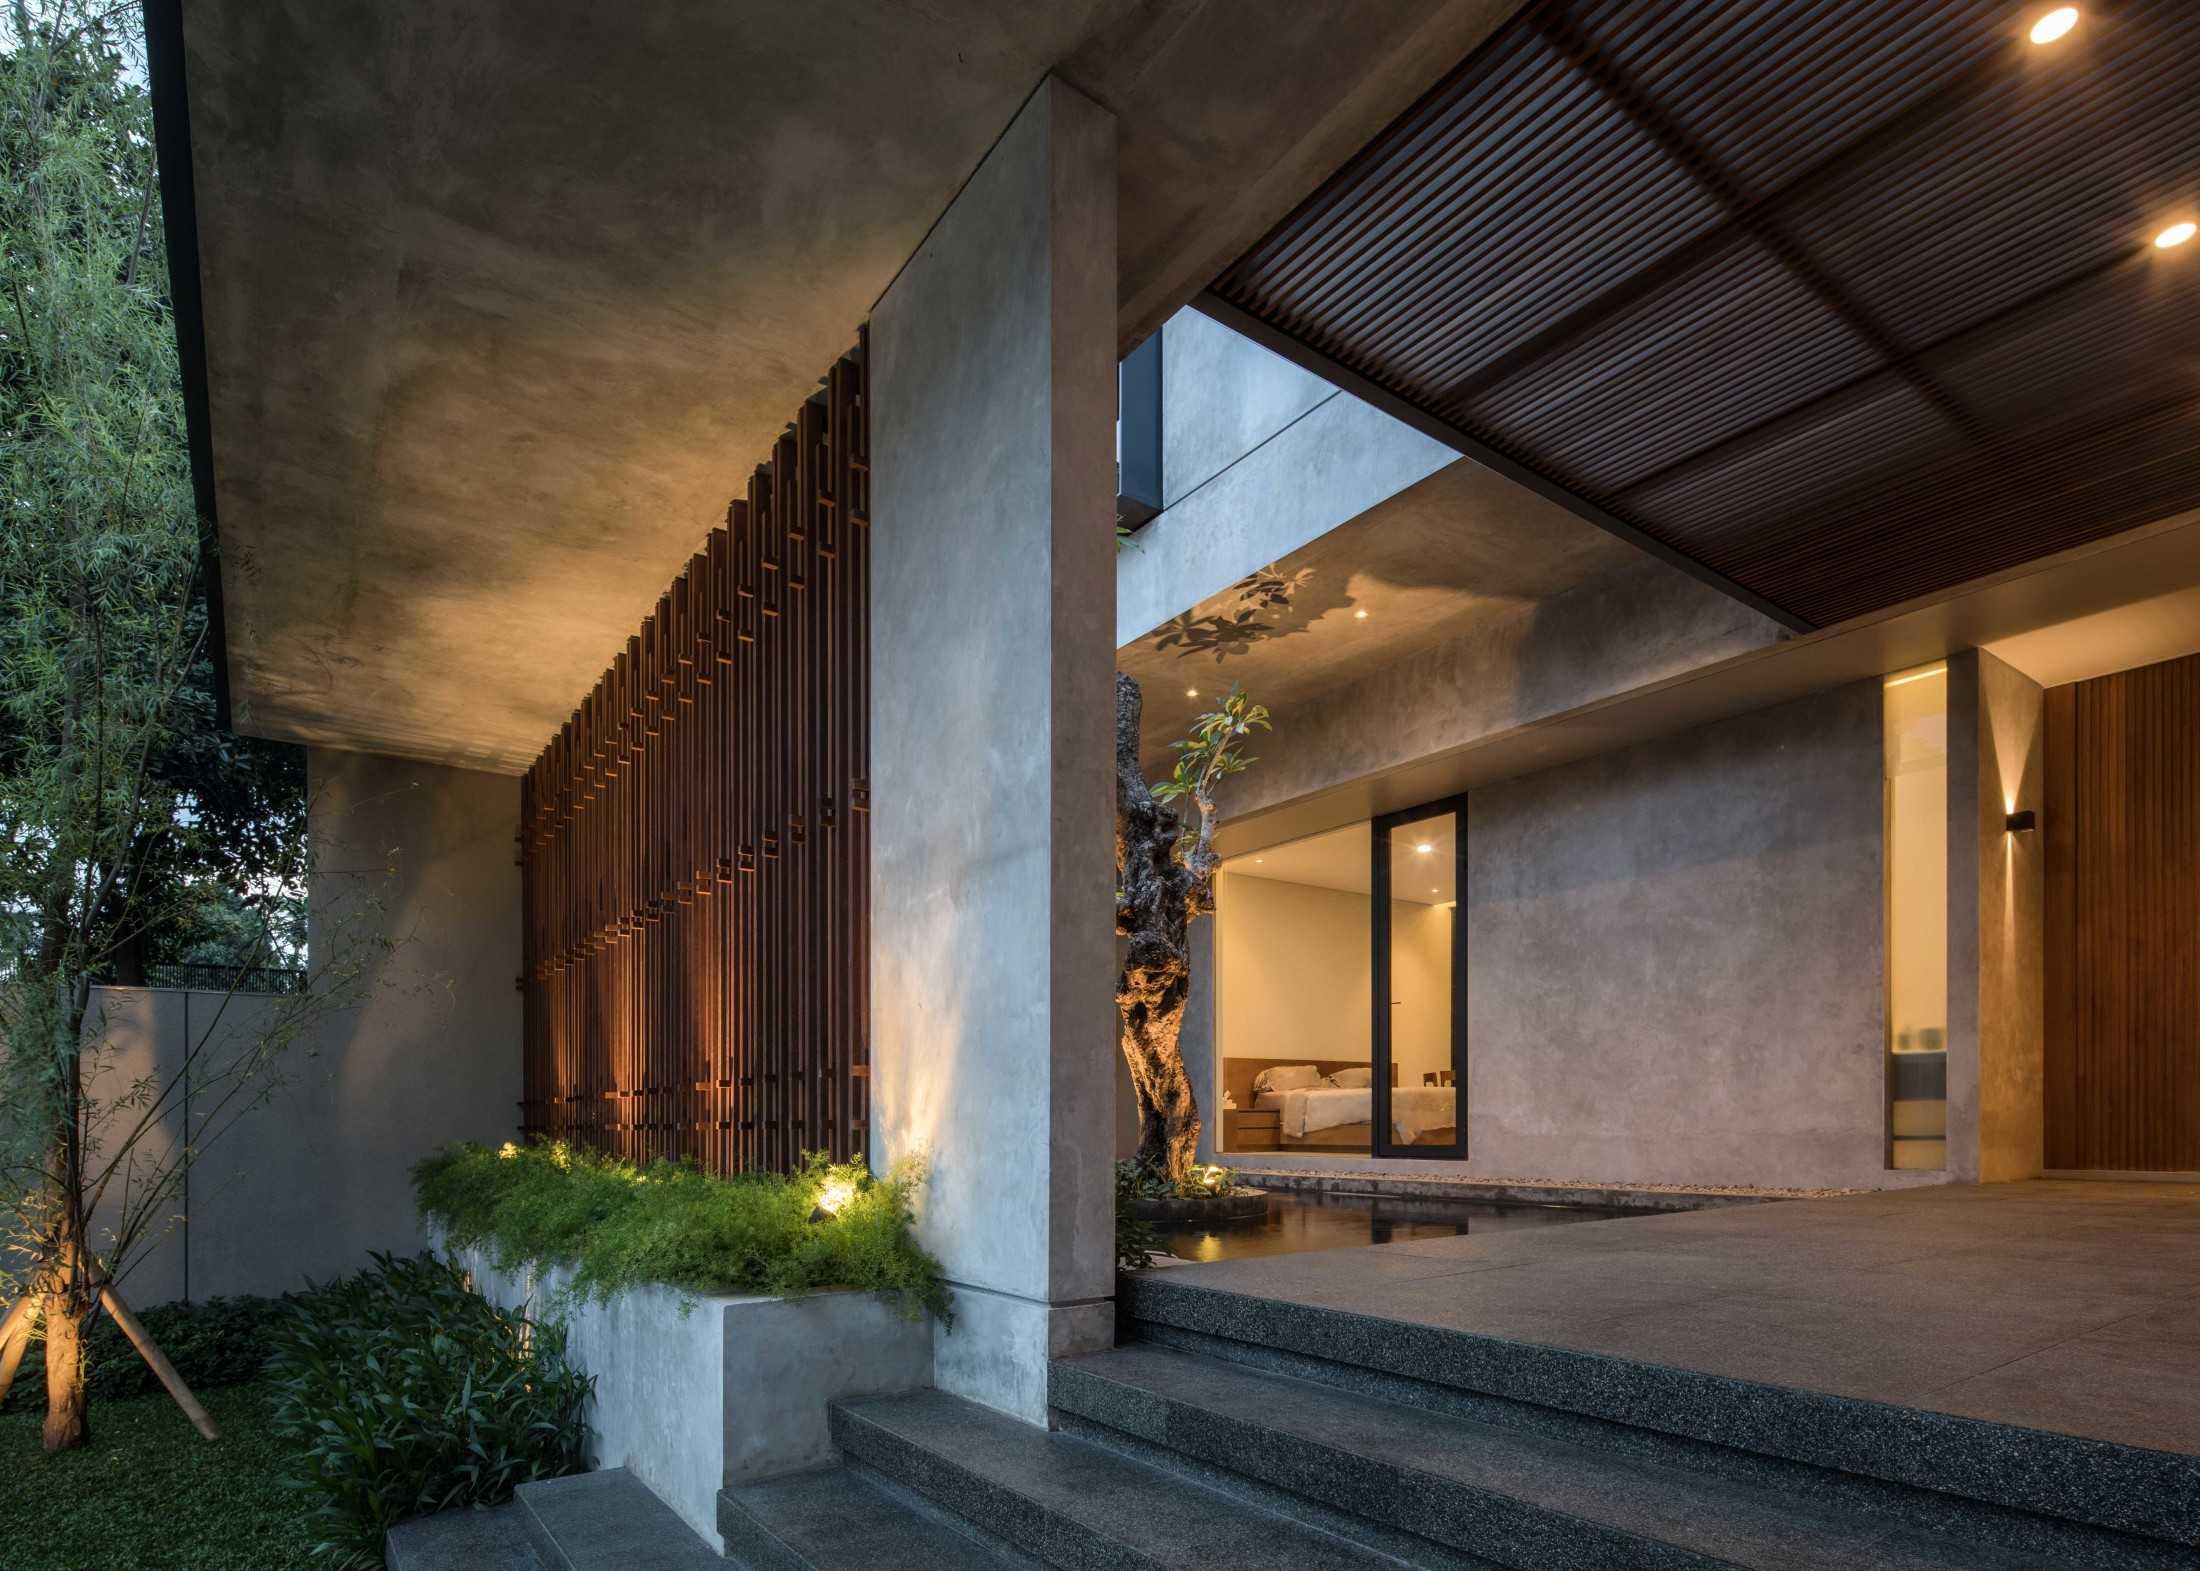 Rakta Studio Rj House Bandung, Kota Bandung, Jawa Barat, Indonesia Bandung, Kota Bandung, Jawa Barat, Indonesia Rakta-Studio-Rj-House  105907